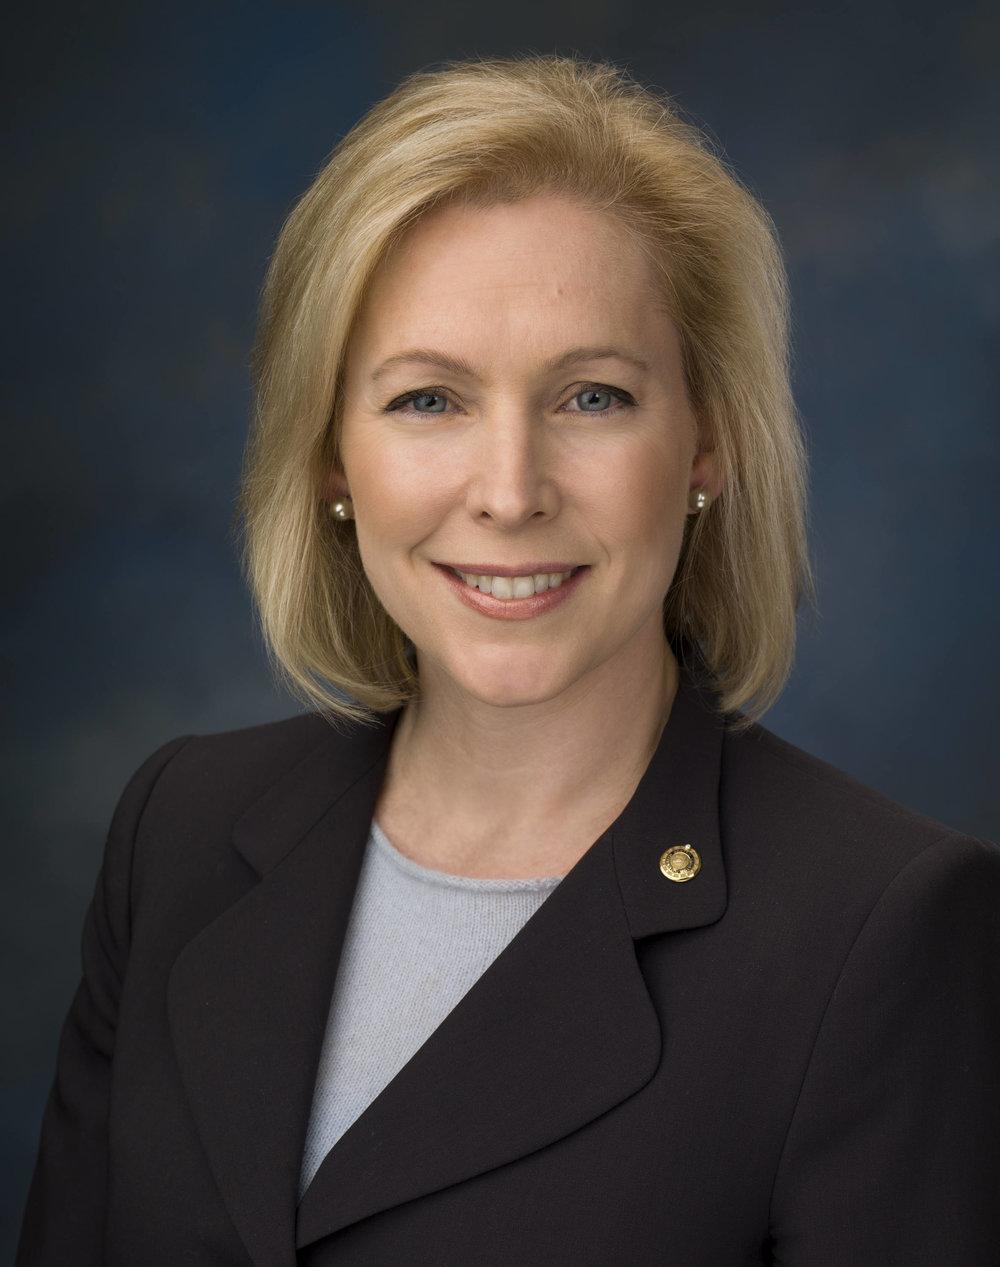 Kirsten Gillibrand Official Portrait